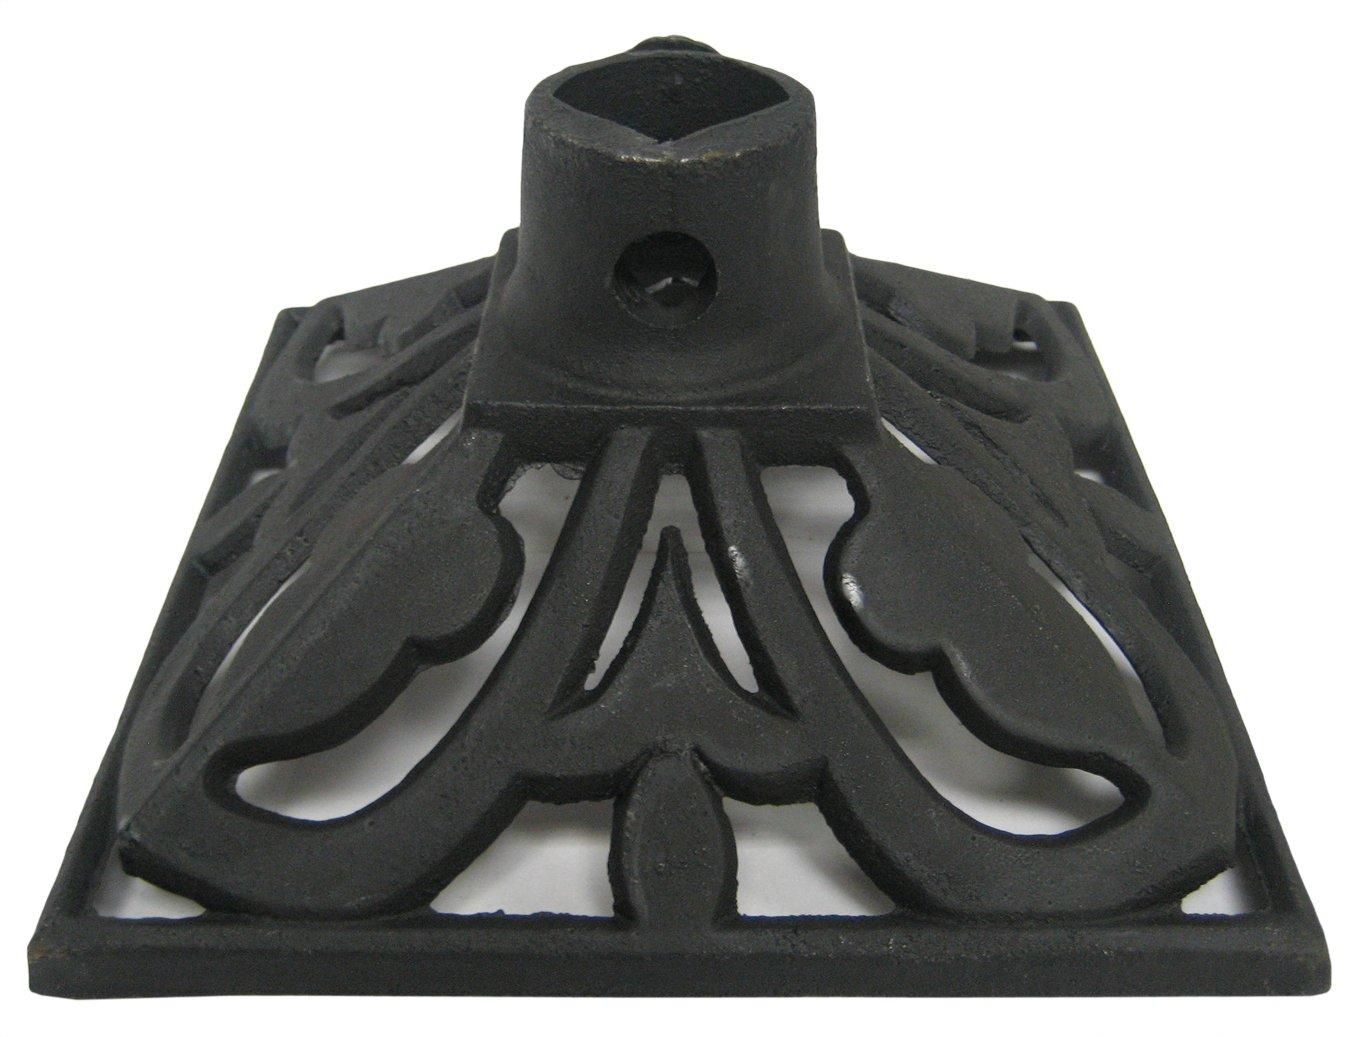 TIKI Brand Cast Iron Torch Stand, Black, 9.1L x 9.1W x 4.8H -Inches Lamplight TIKI 1312322